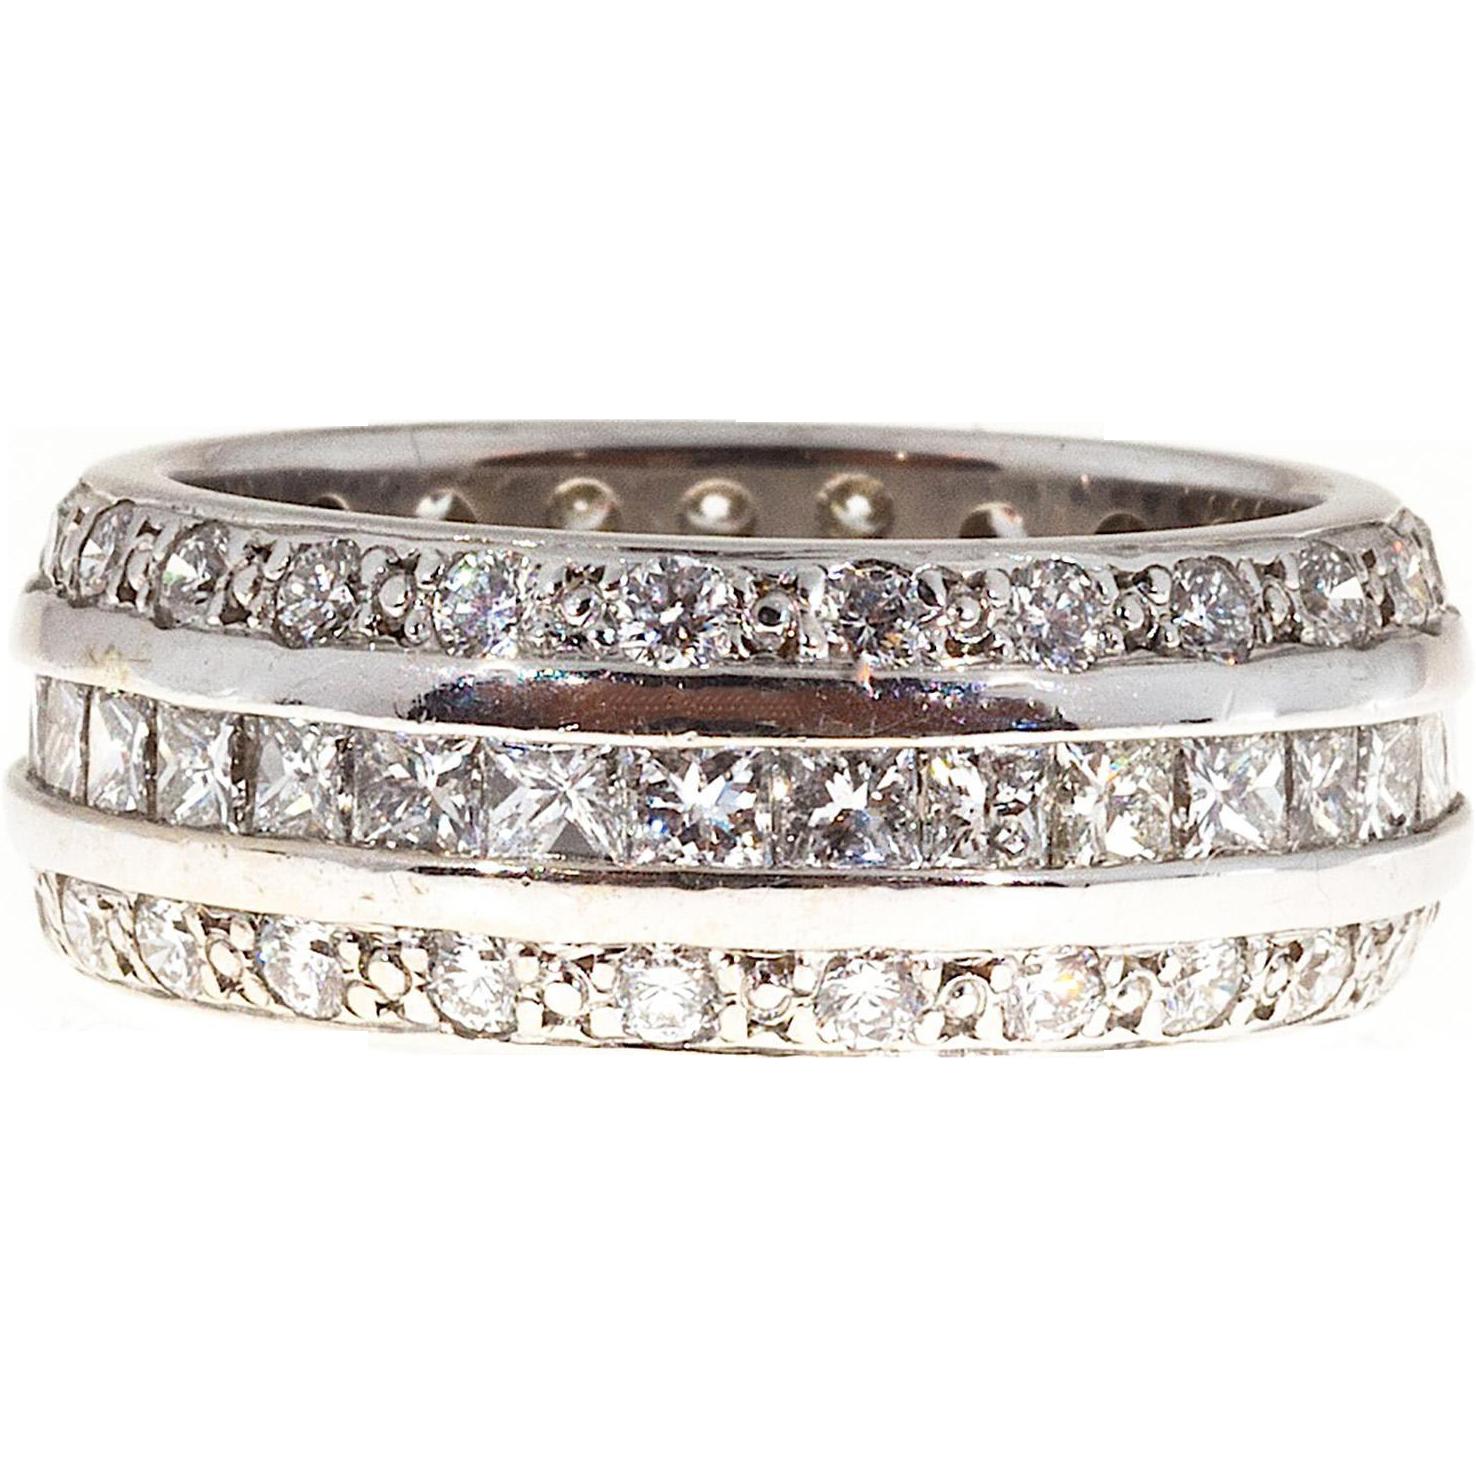 3 Row Diamond Princess Round Cut 14k White Gold Band Ring